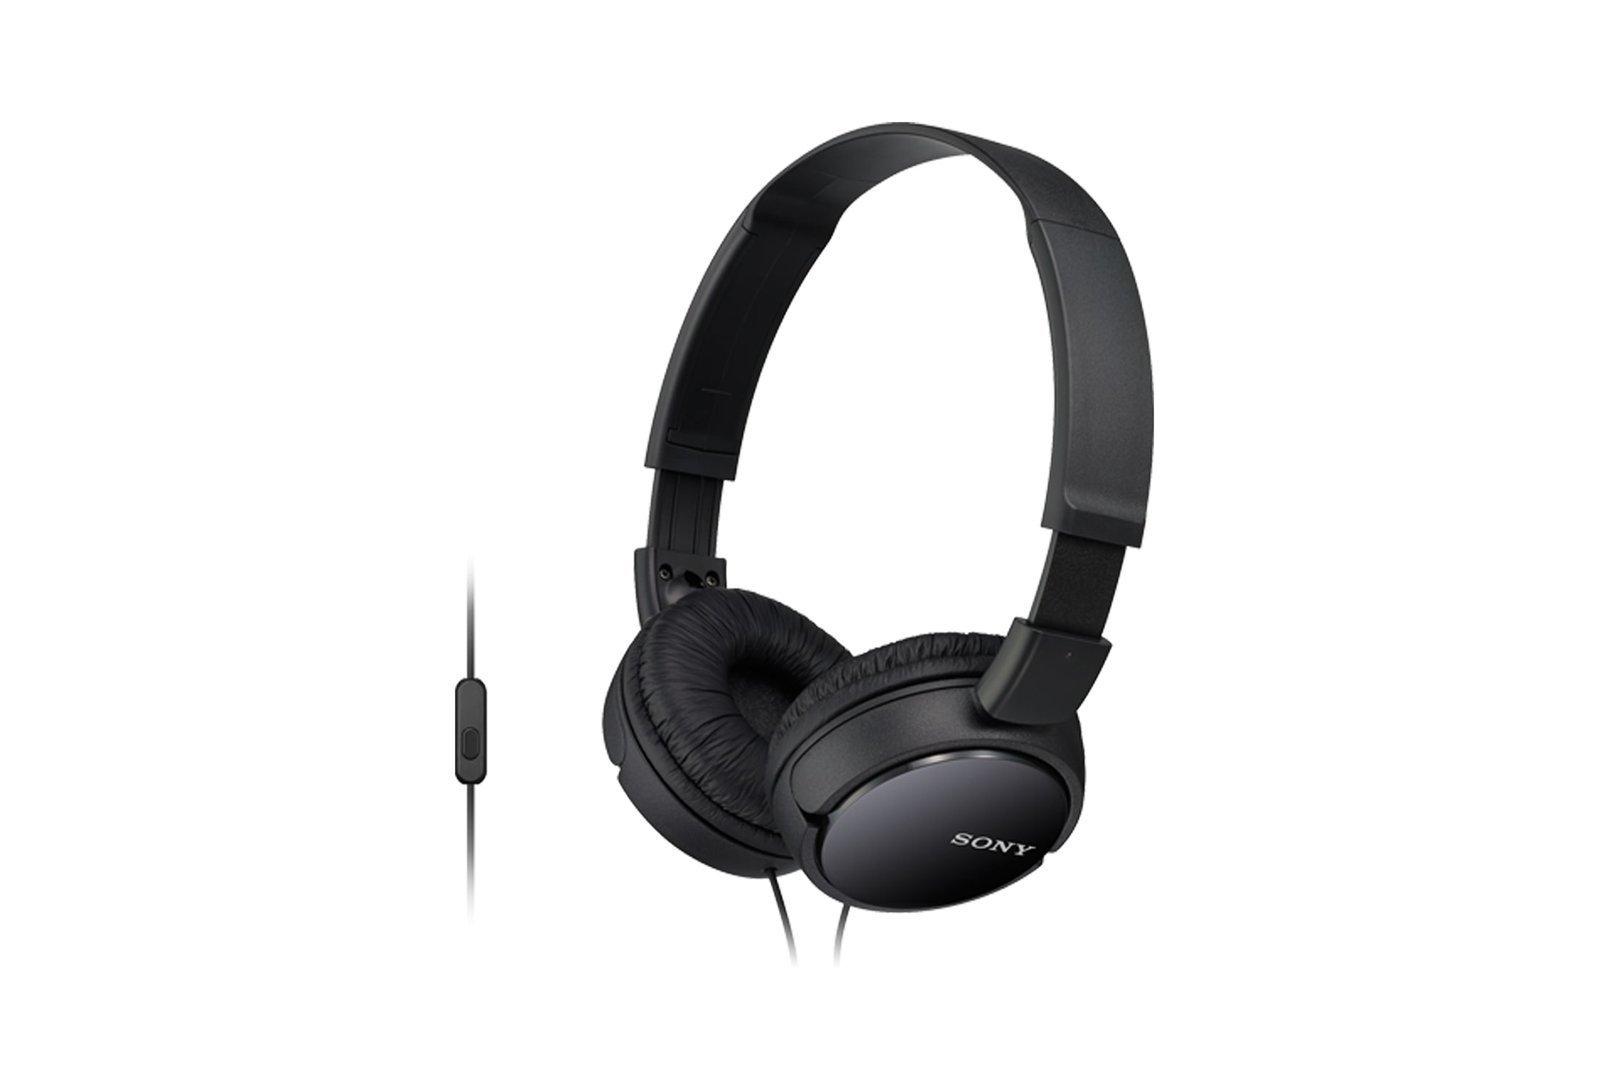 Sony MDR-ZX110 Headphones Black